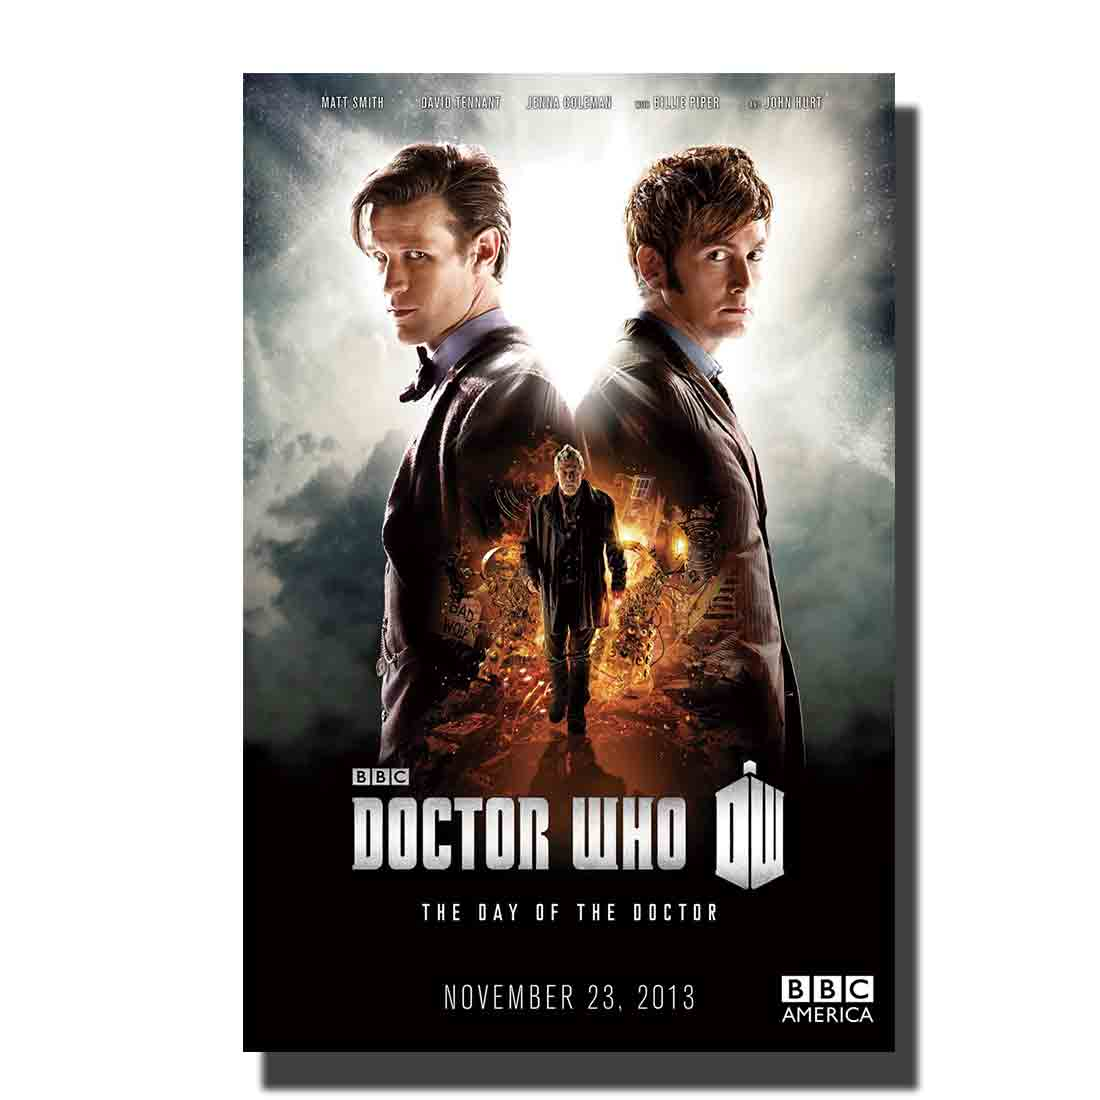 Doctor Who Season 8 TV Series Art Poster Print Home Wall decoration8x12 12x18 24x36 decor canvas room